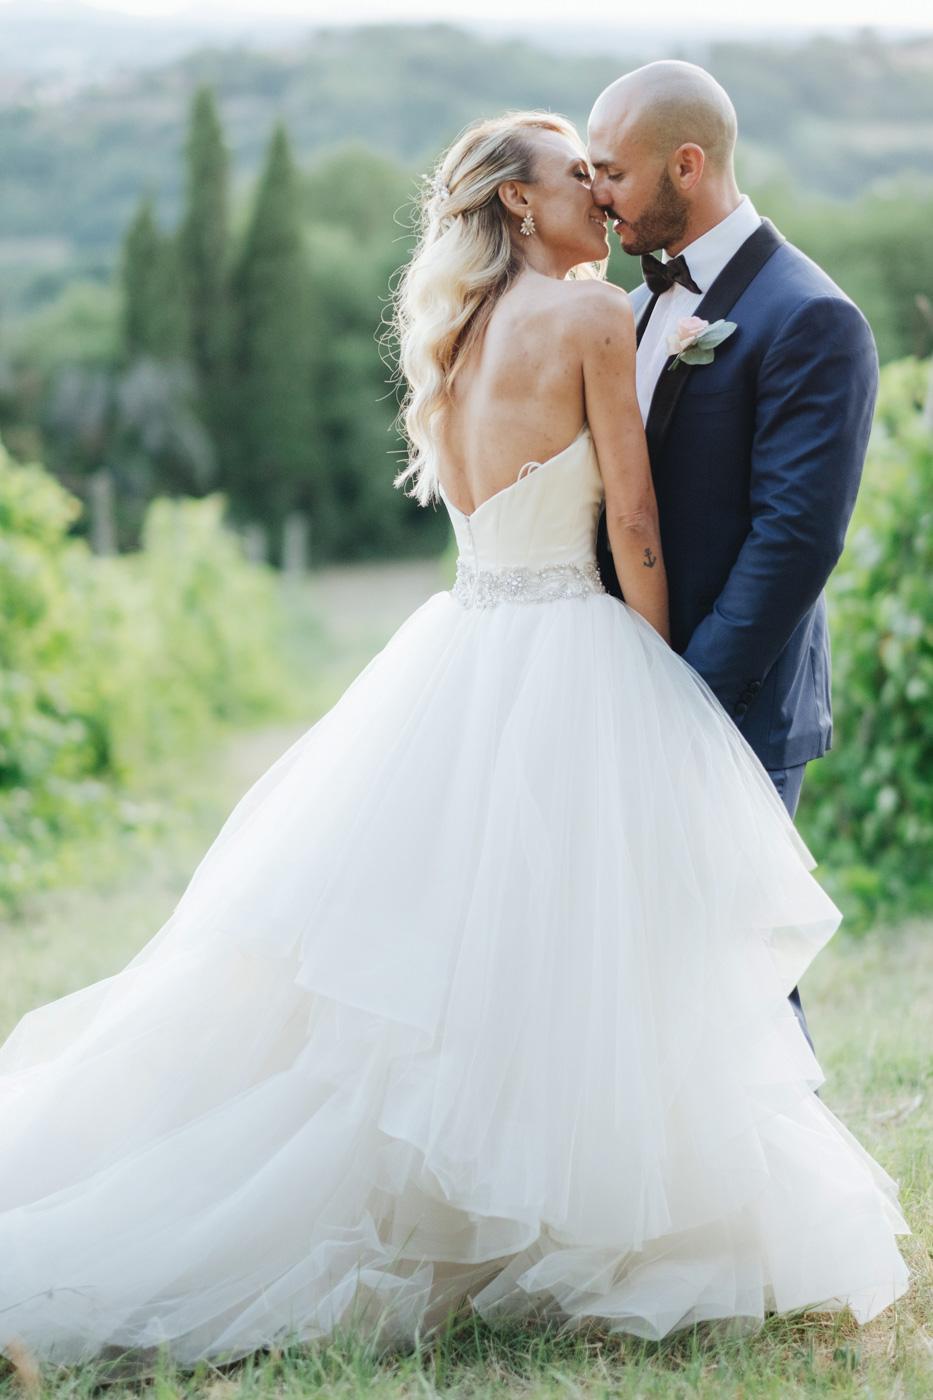 Matrimoni all'italiana wedding photographer italy-124.jpg